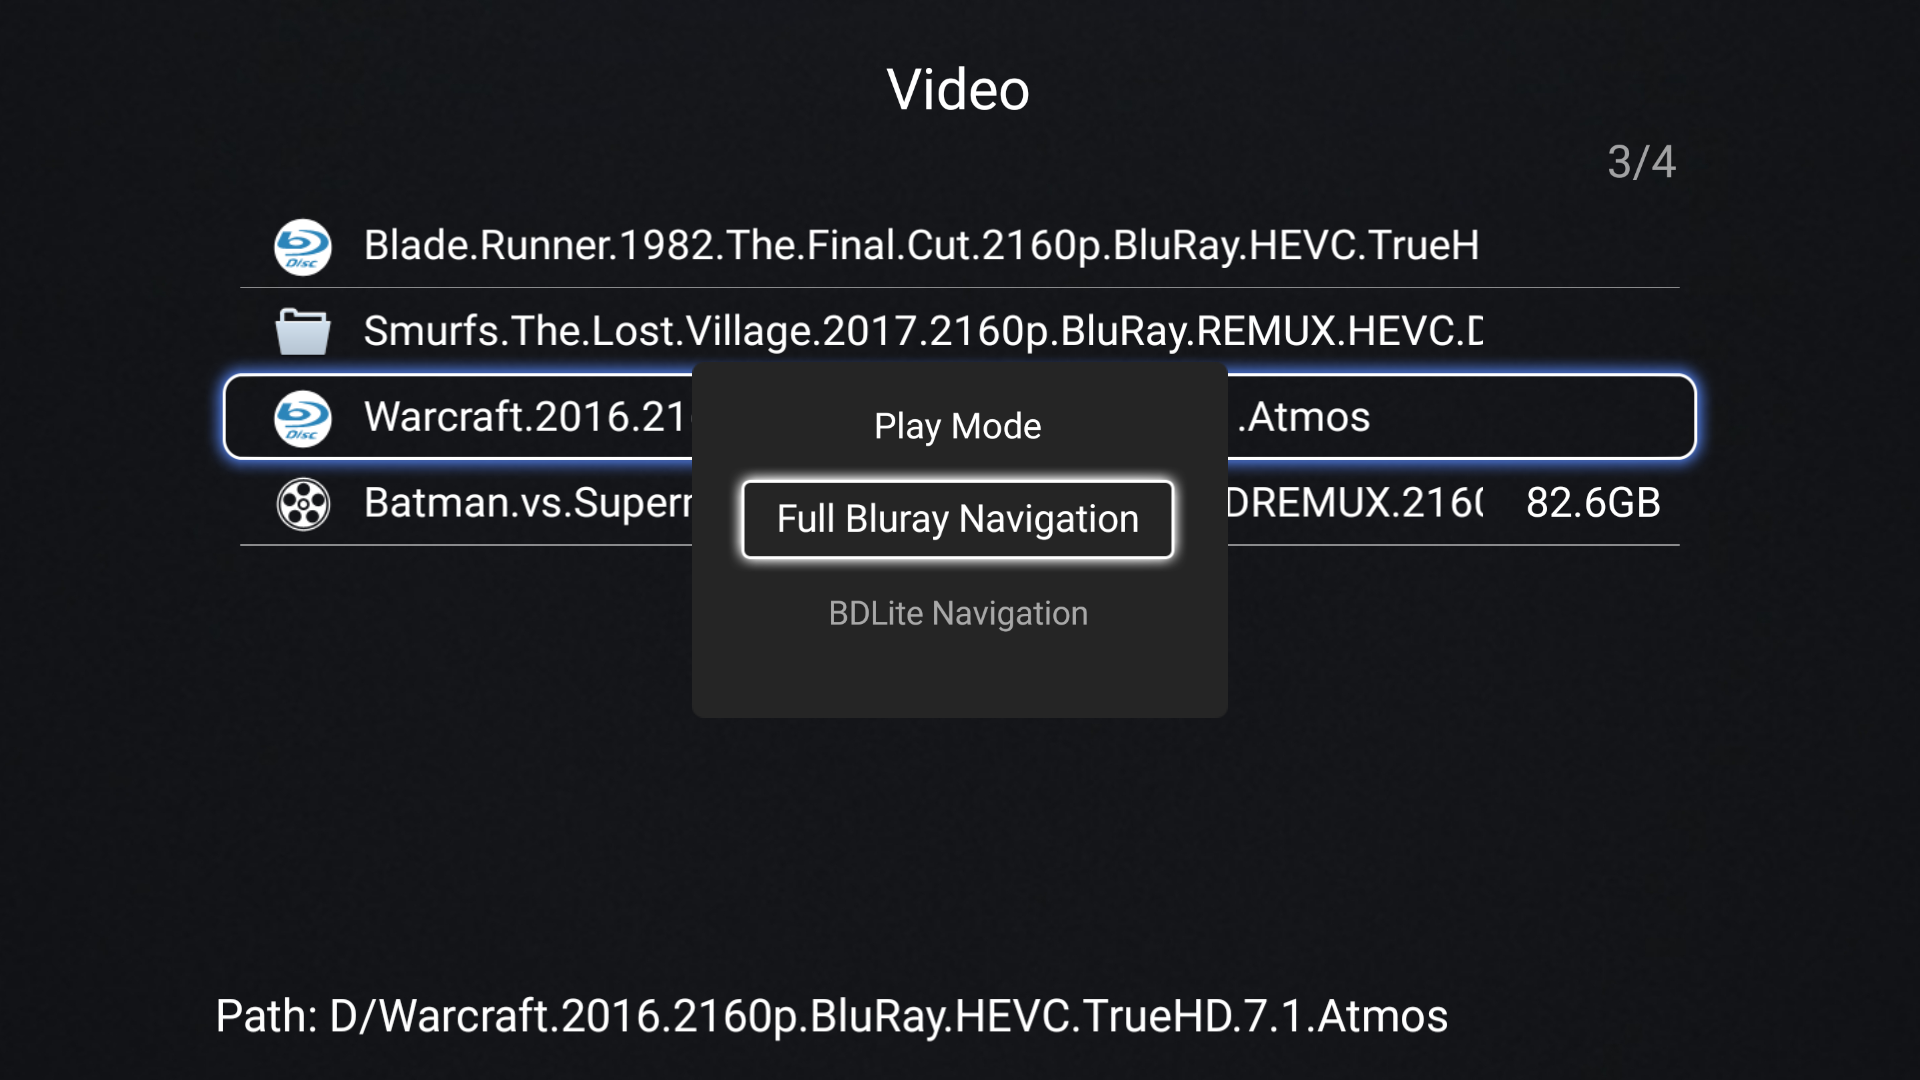 HiMedia Q10 Pro 4K TV Box Review - Part 2: Full Blu-ray Navigation